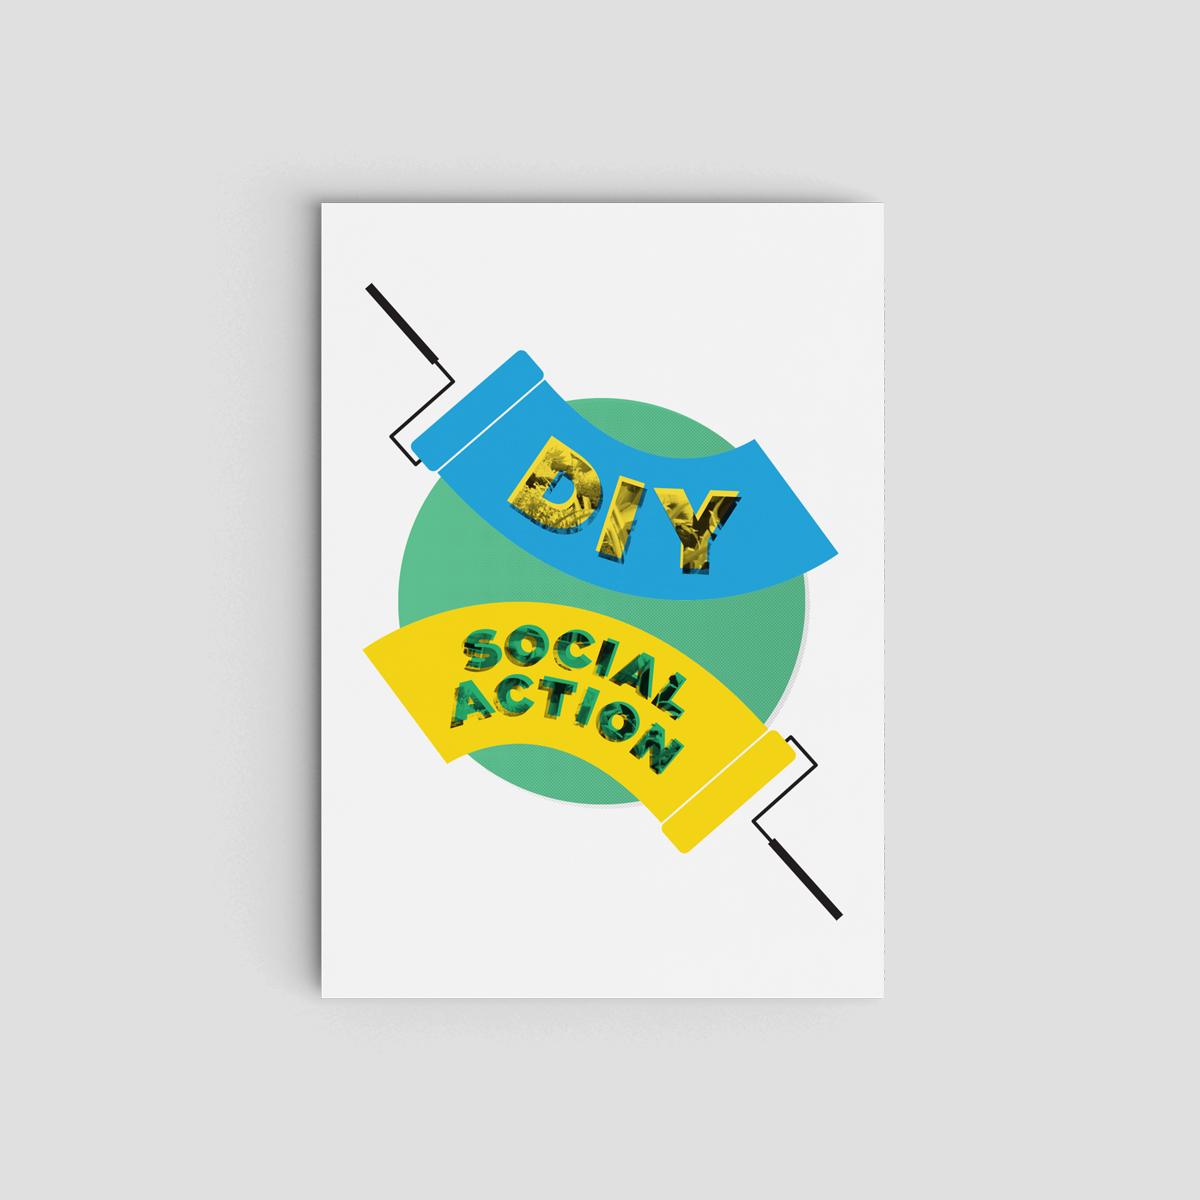 SARF-DIY-SOCIAL-ACTION-9